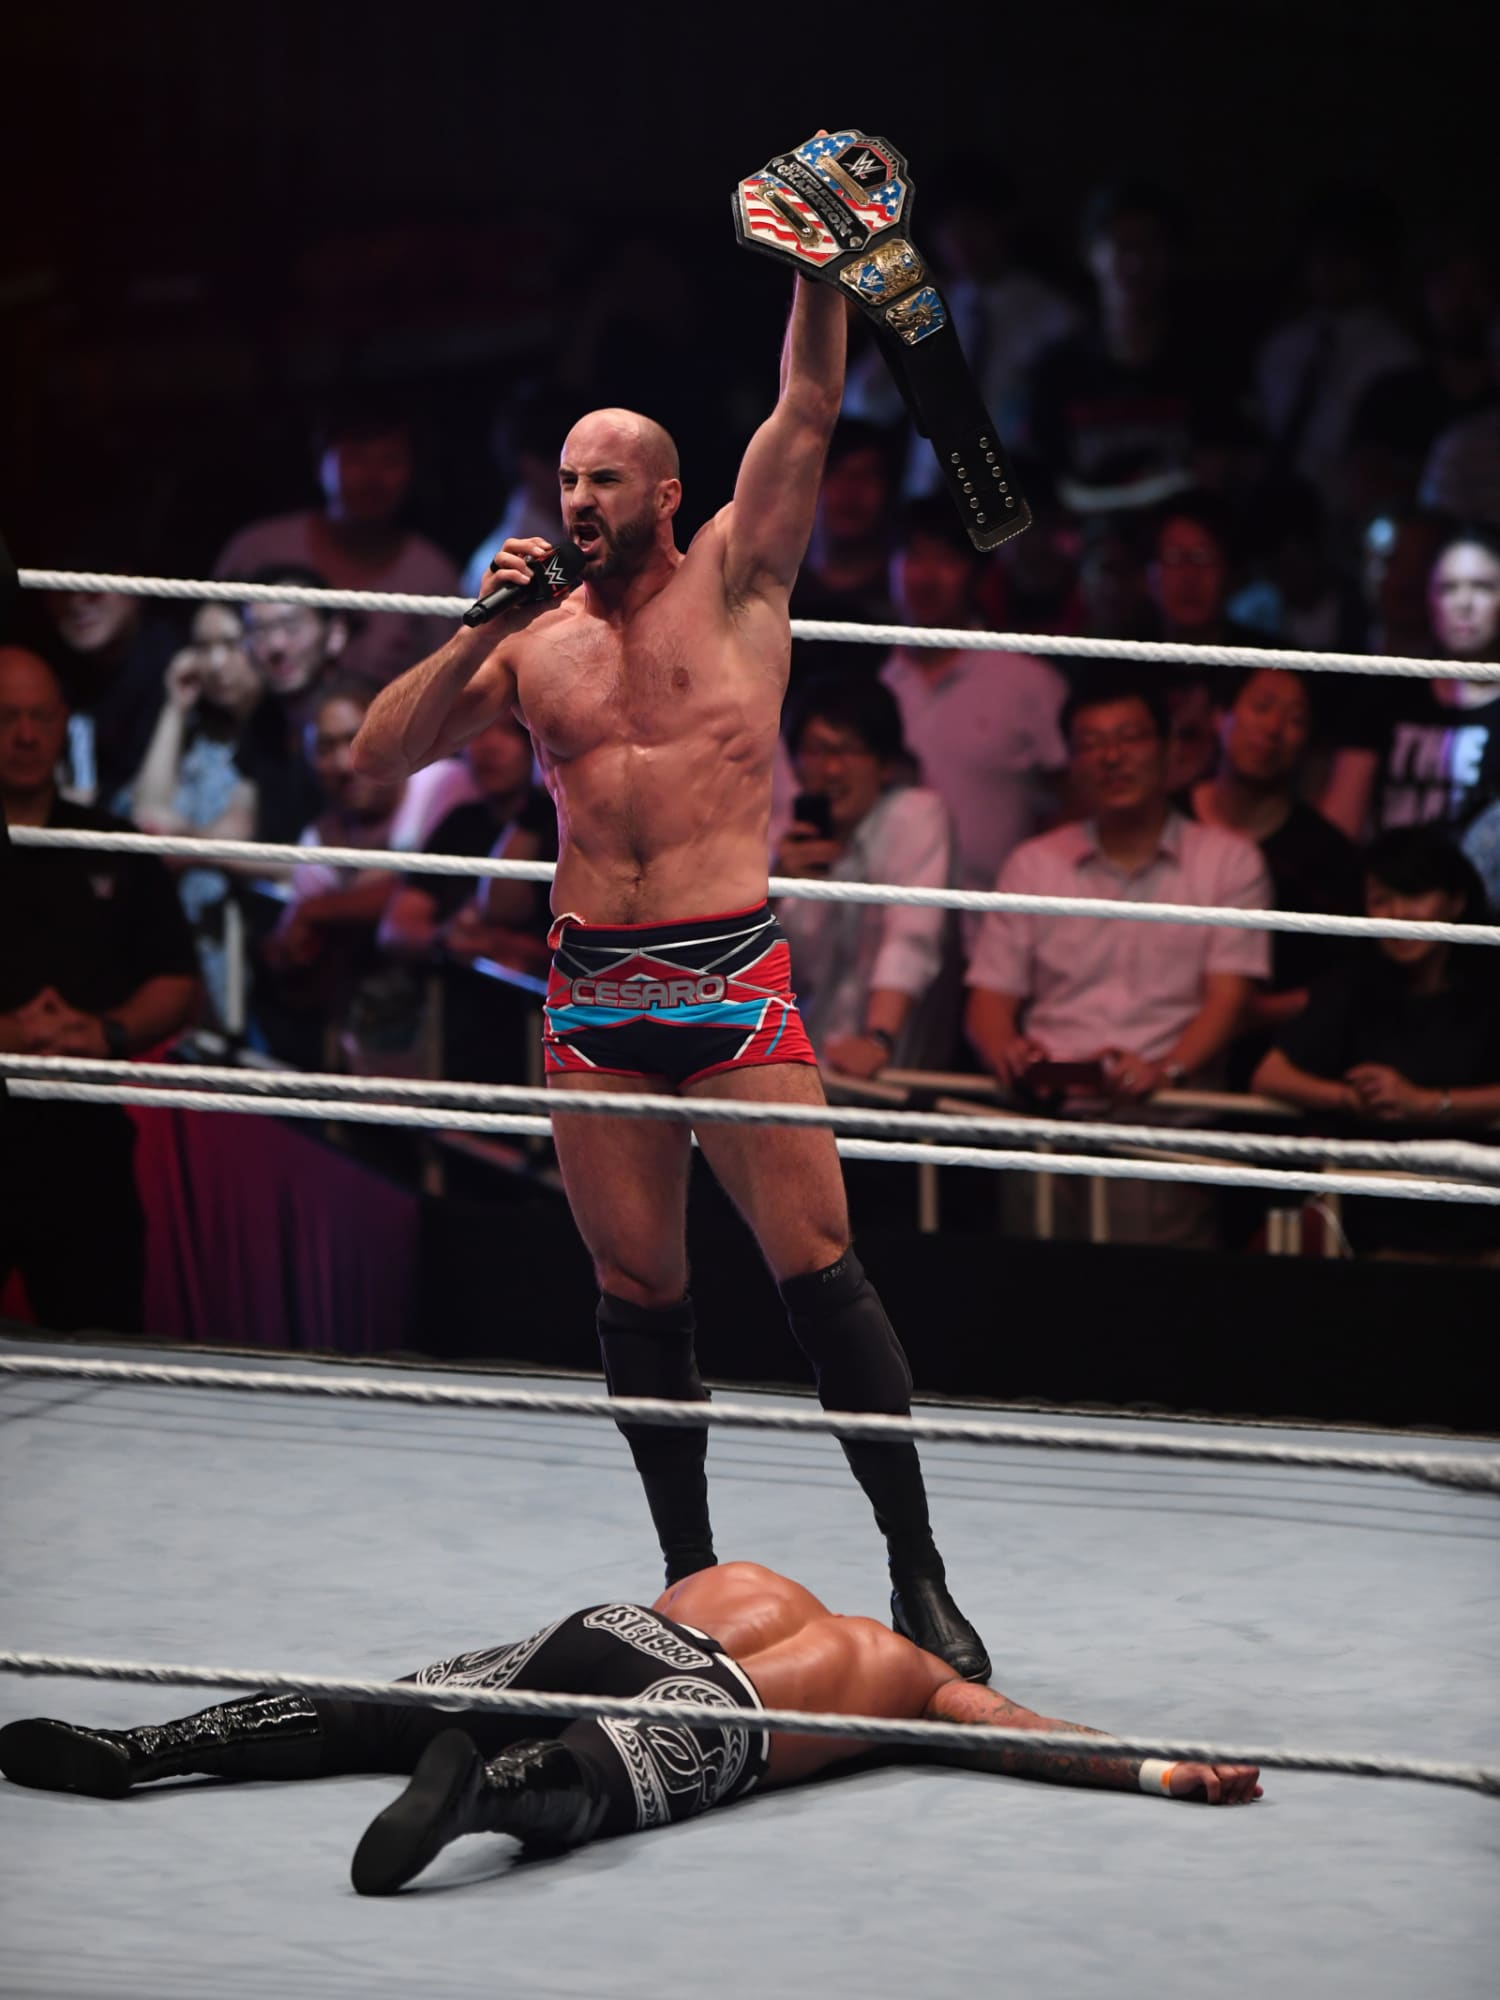 WWE needs to follow up on Cesaro's win over Daniel Bryan